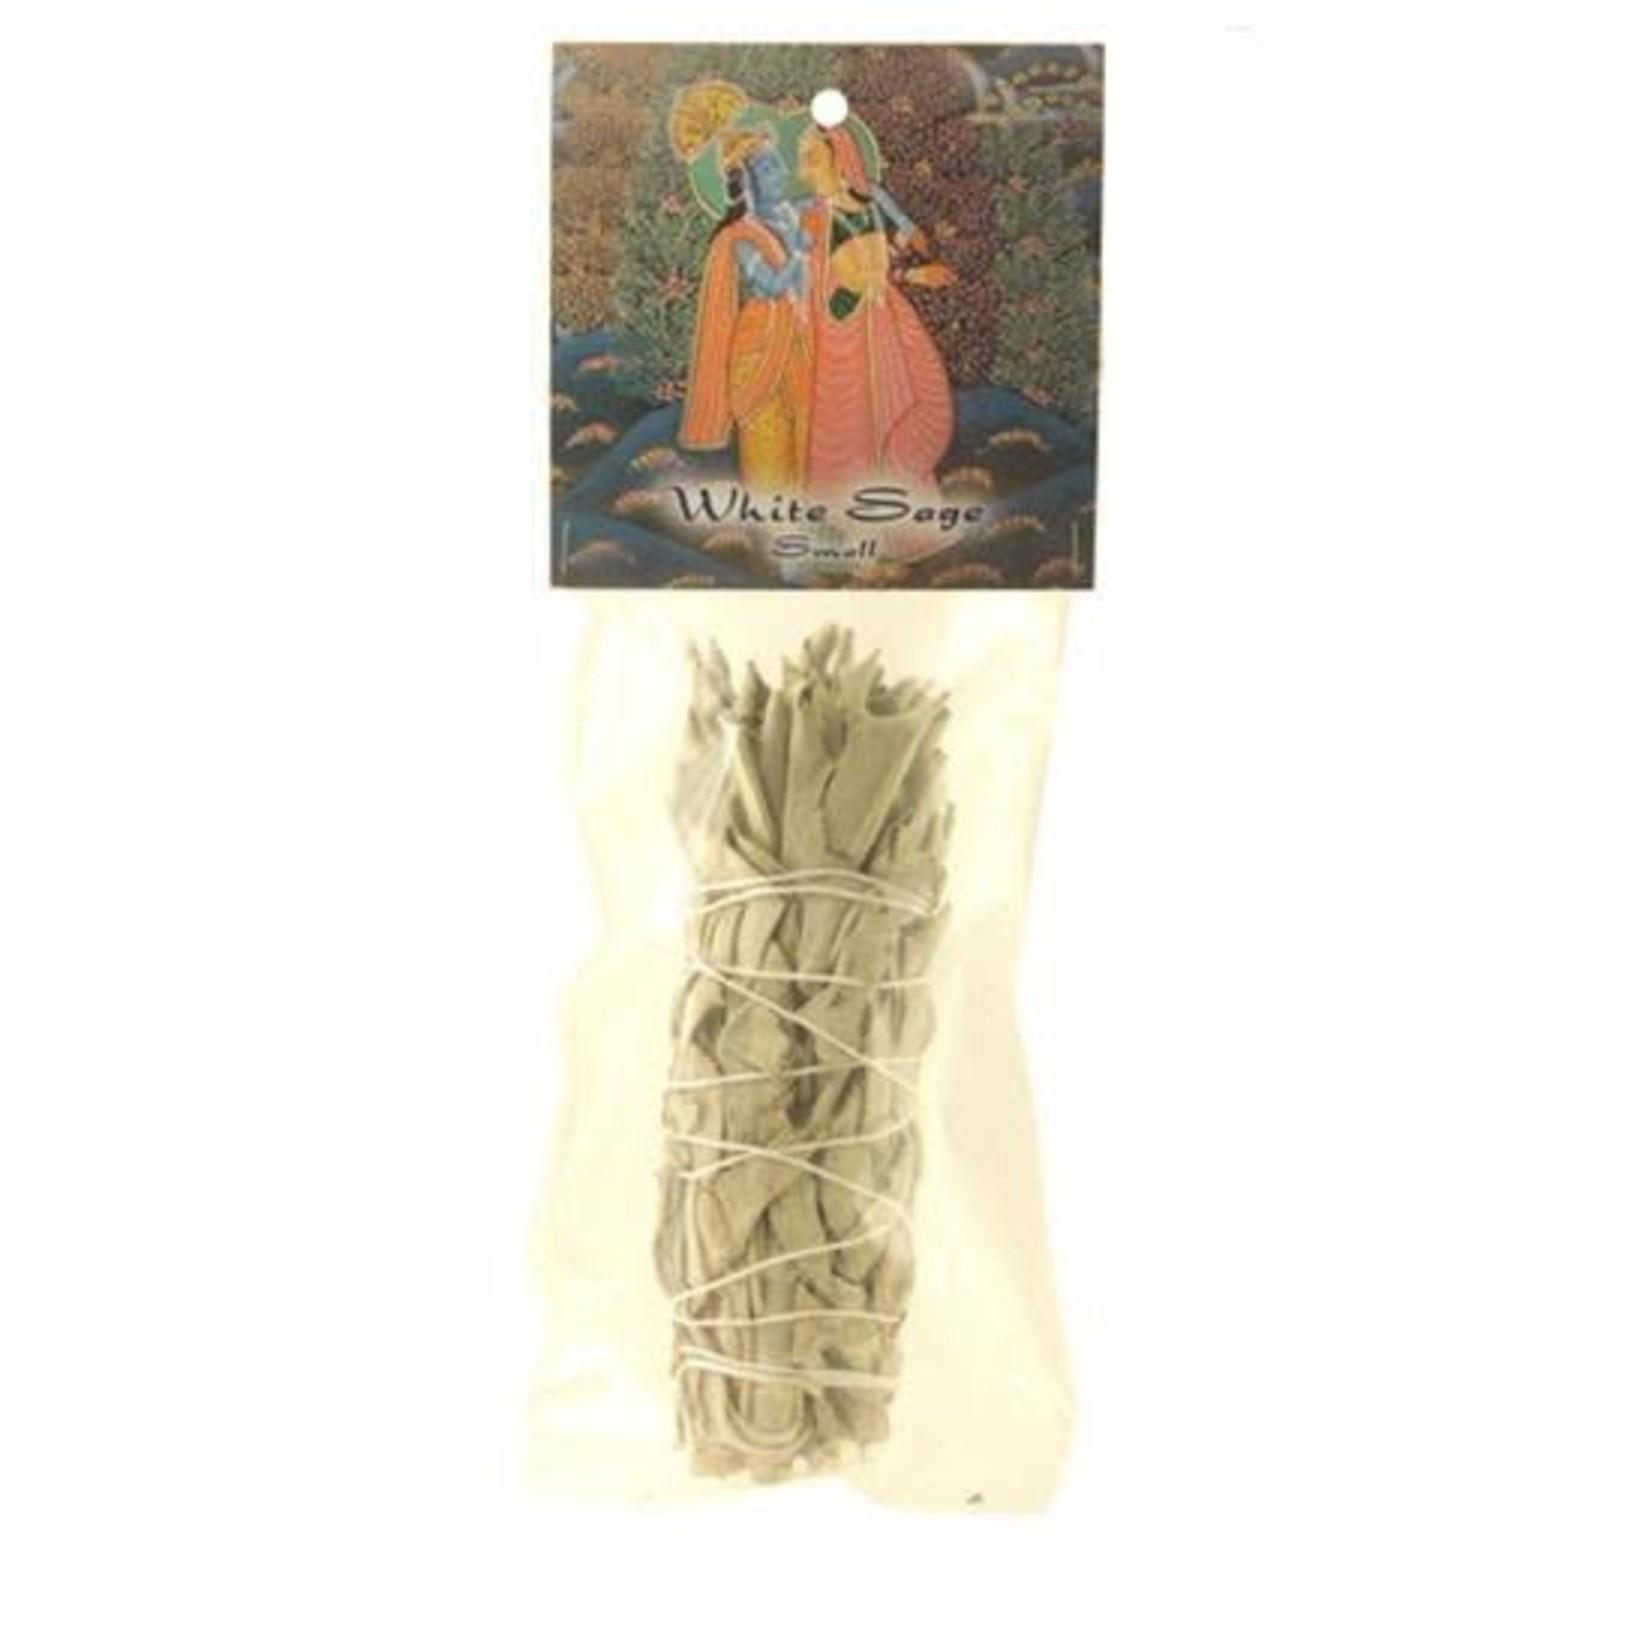 Prabhujis Gifts White Sage Smudge Stick - Small Bundle